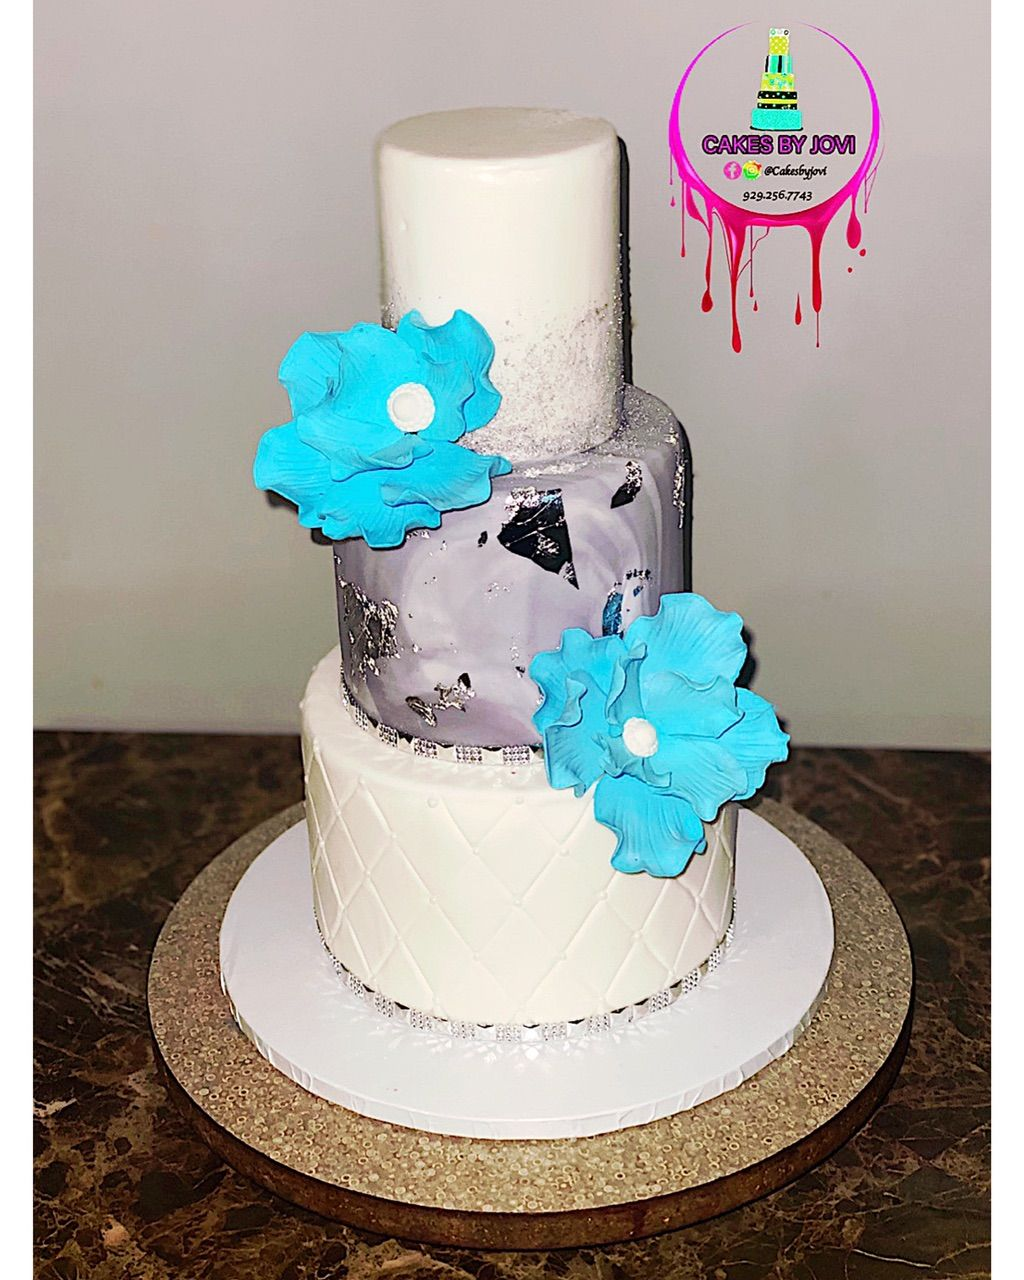 Cakes By Jovi